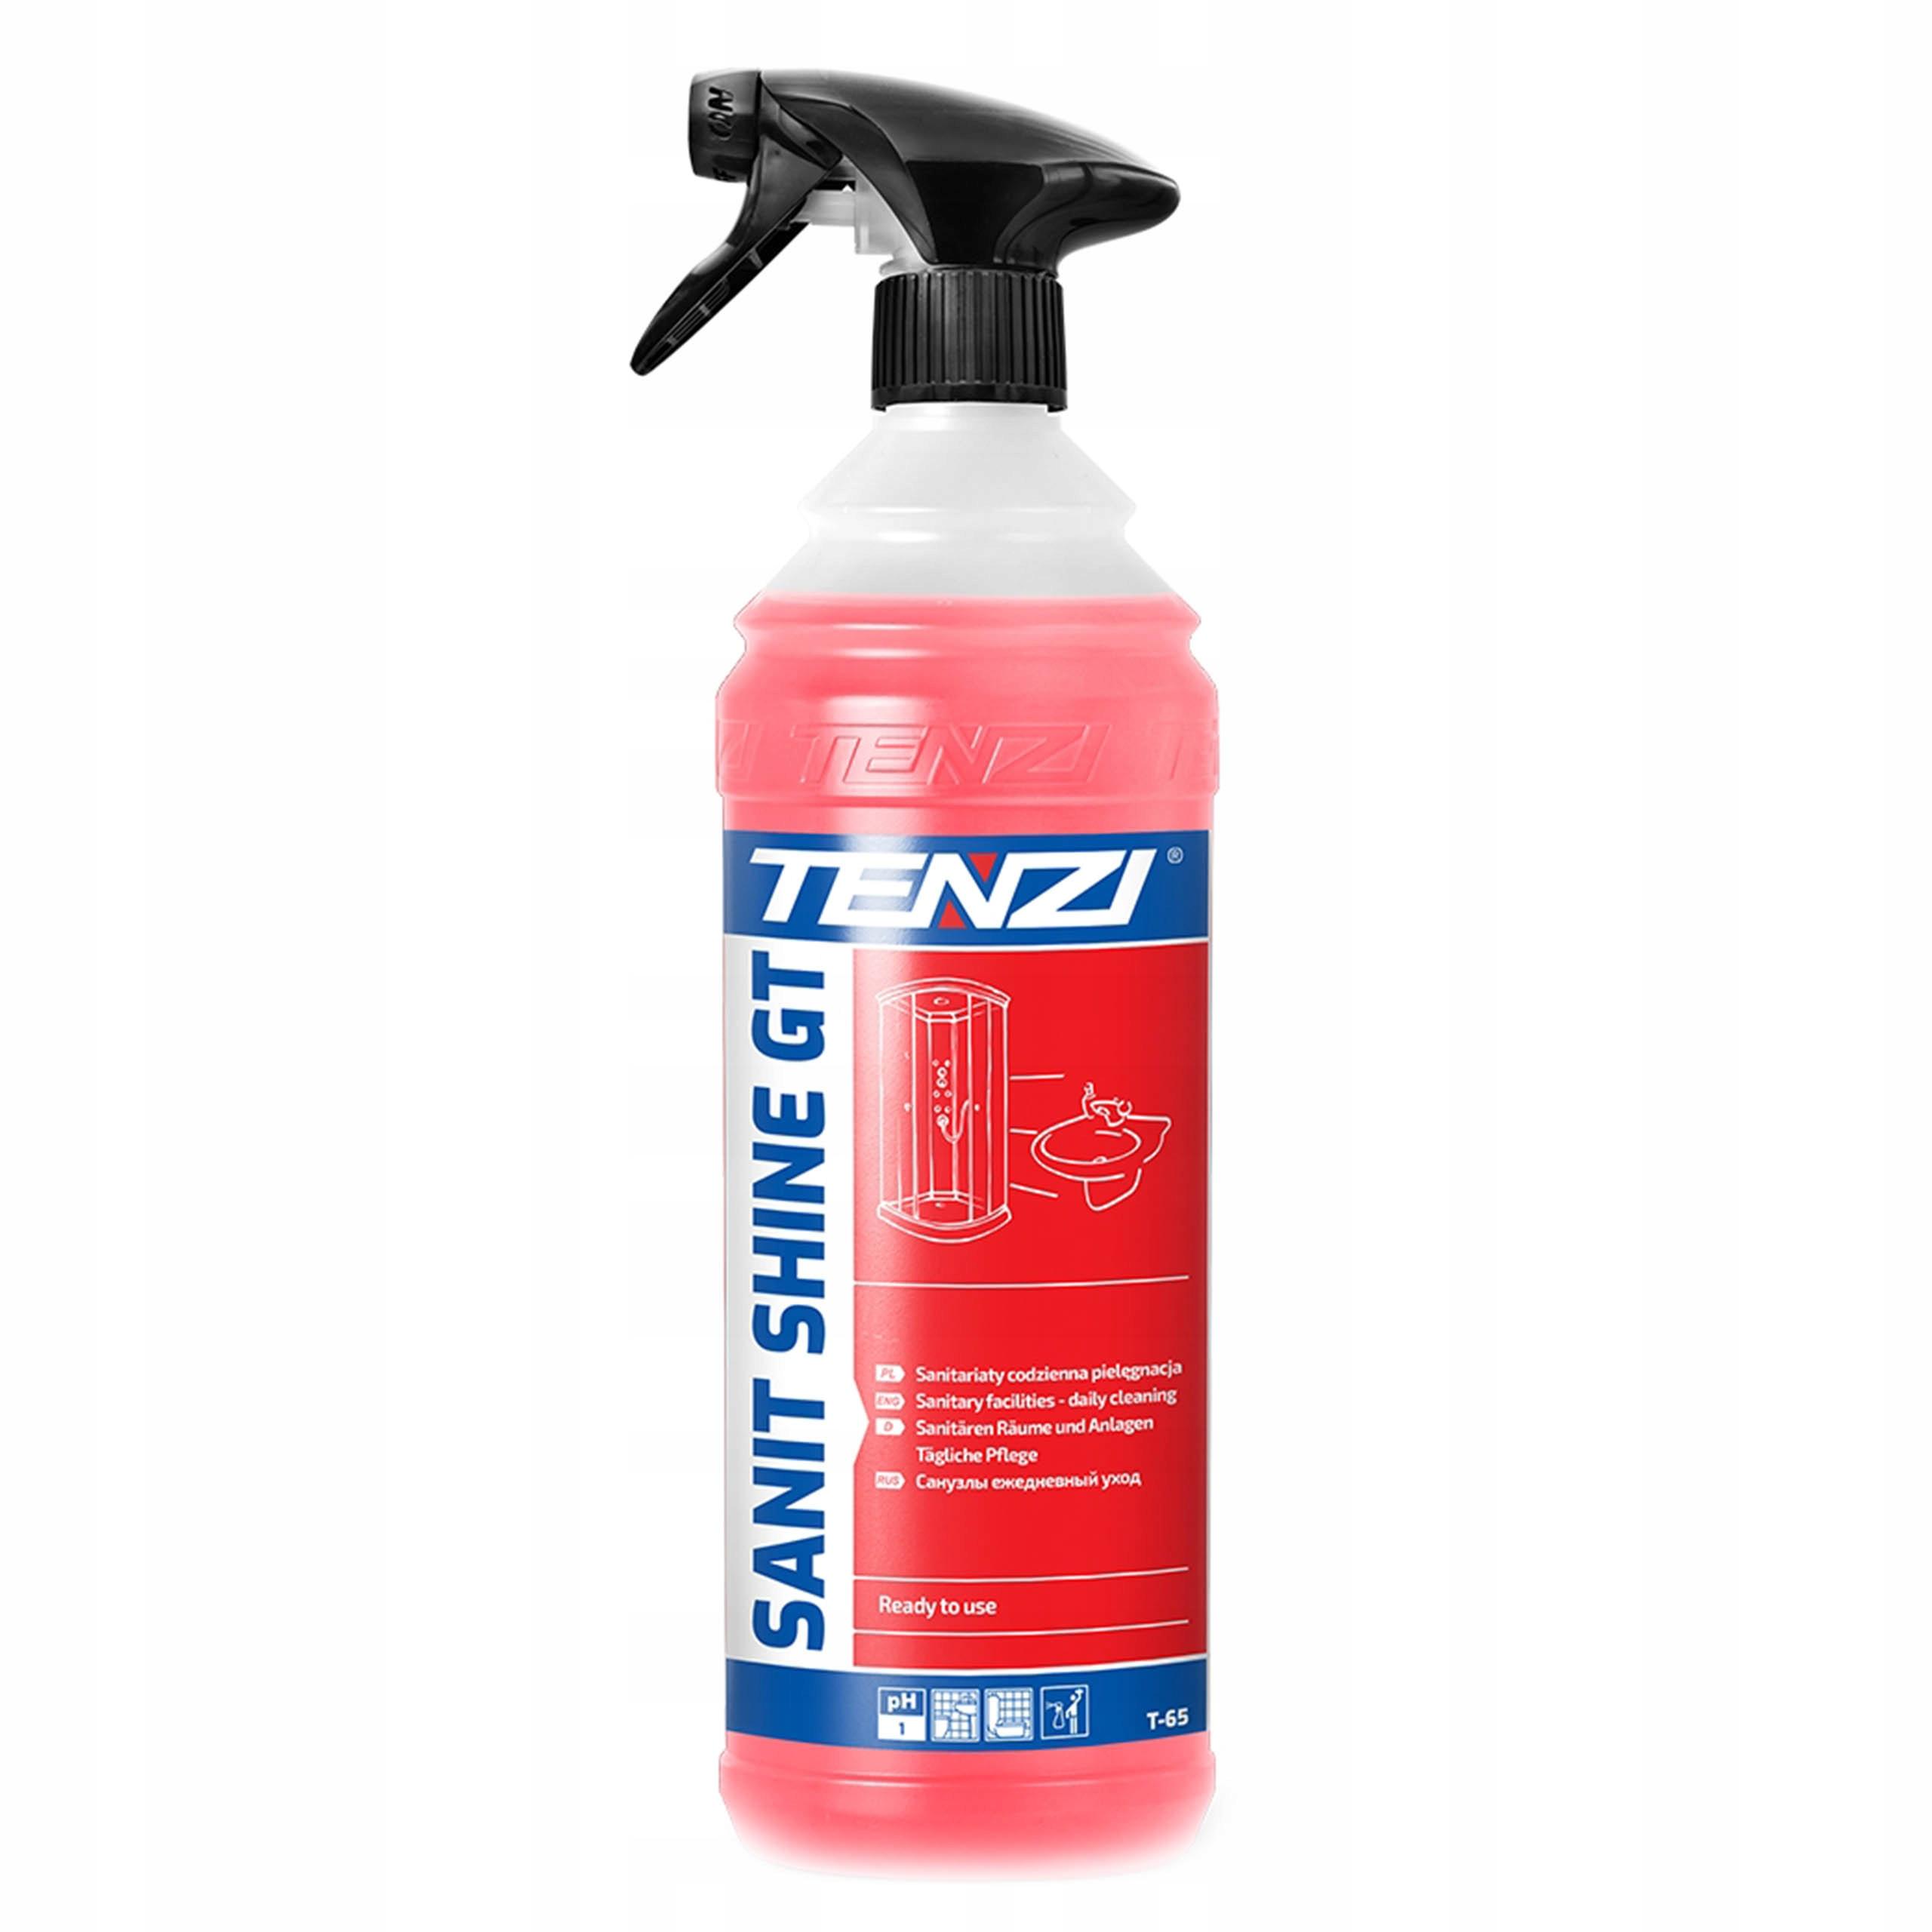 Tenzi Sanit Shine GT 1L Ванные ванные стиральные тока